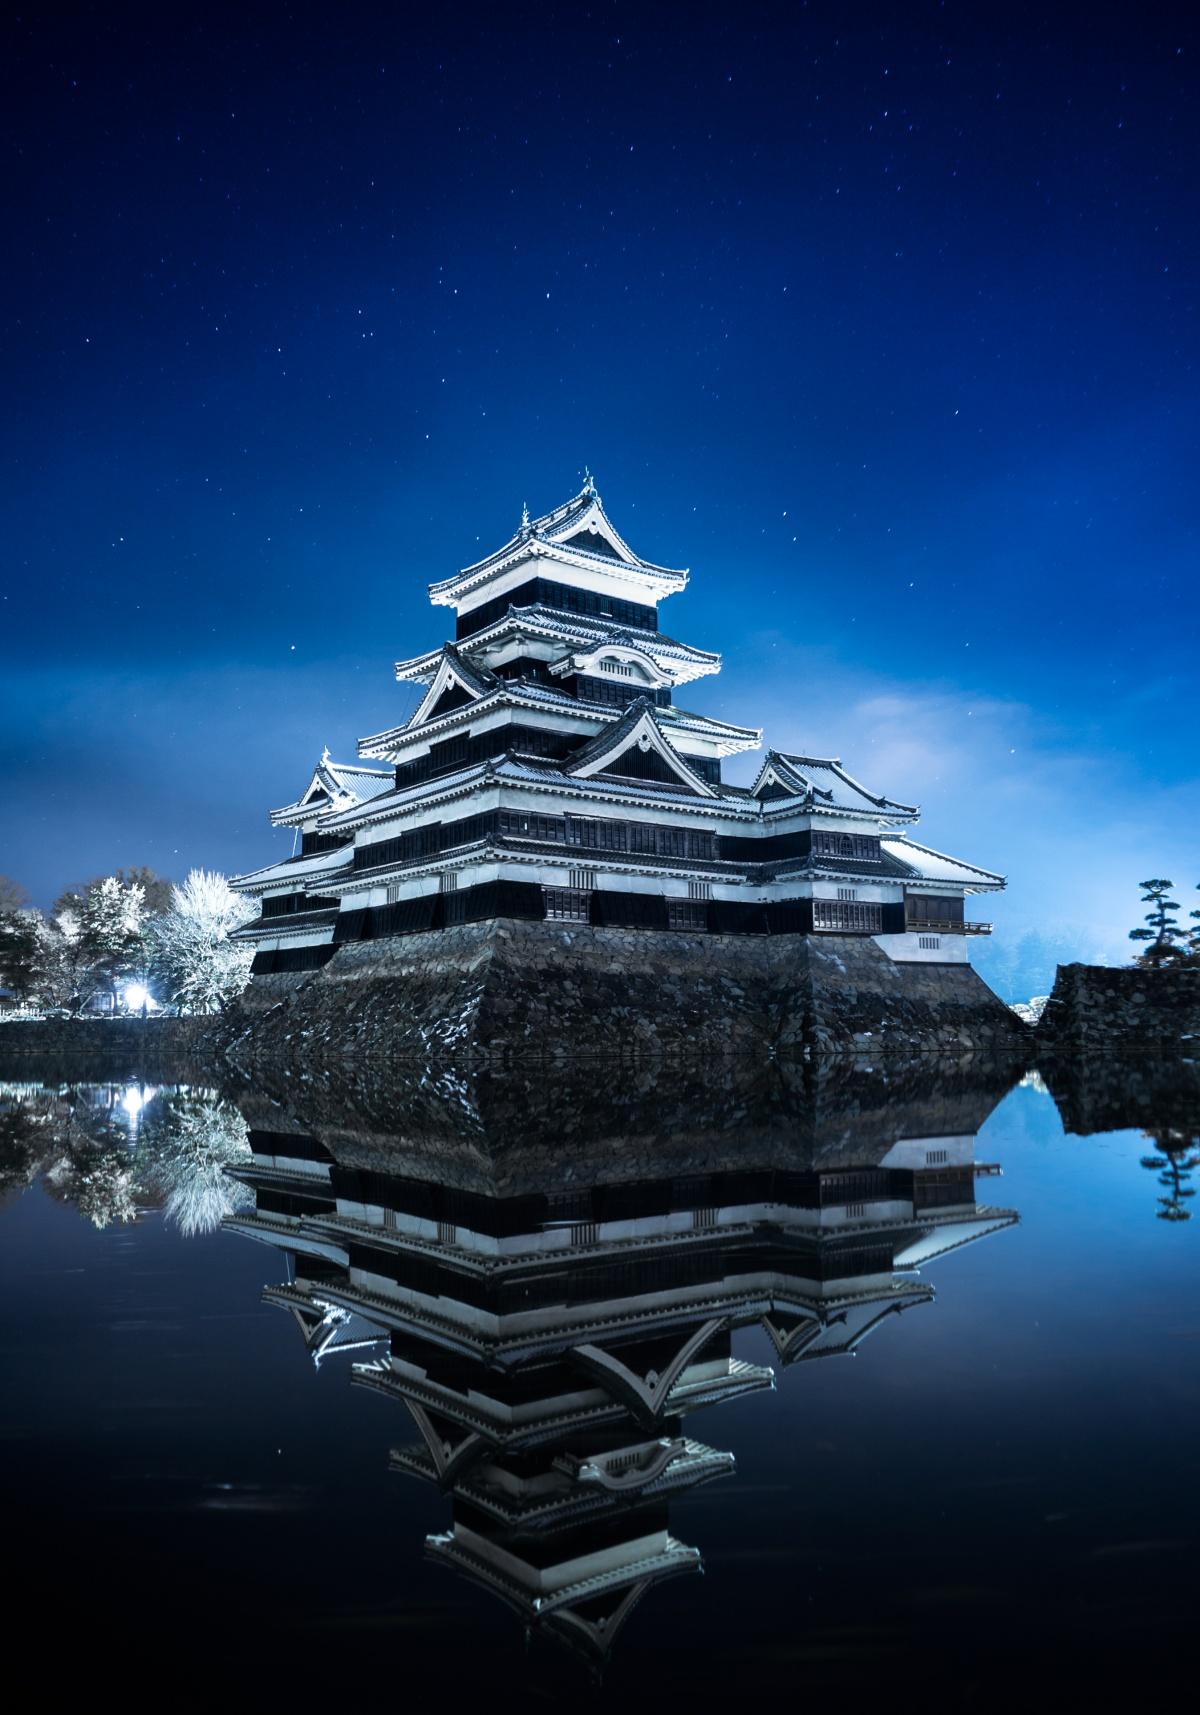 Nightshot of Matsumoto Castle in Japan